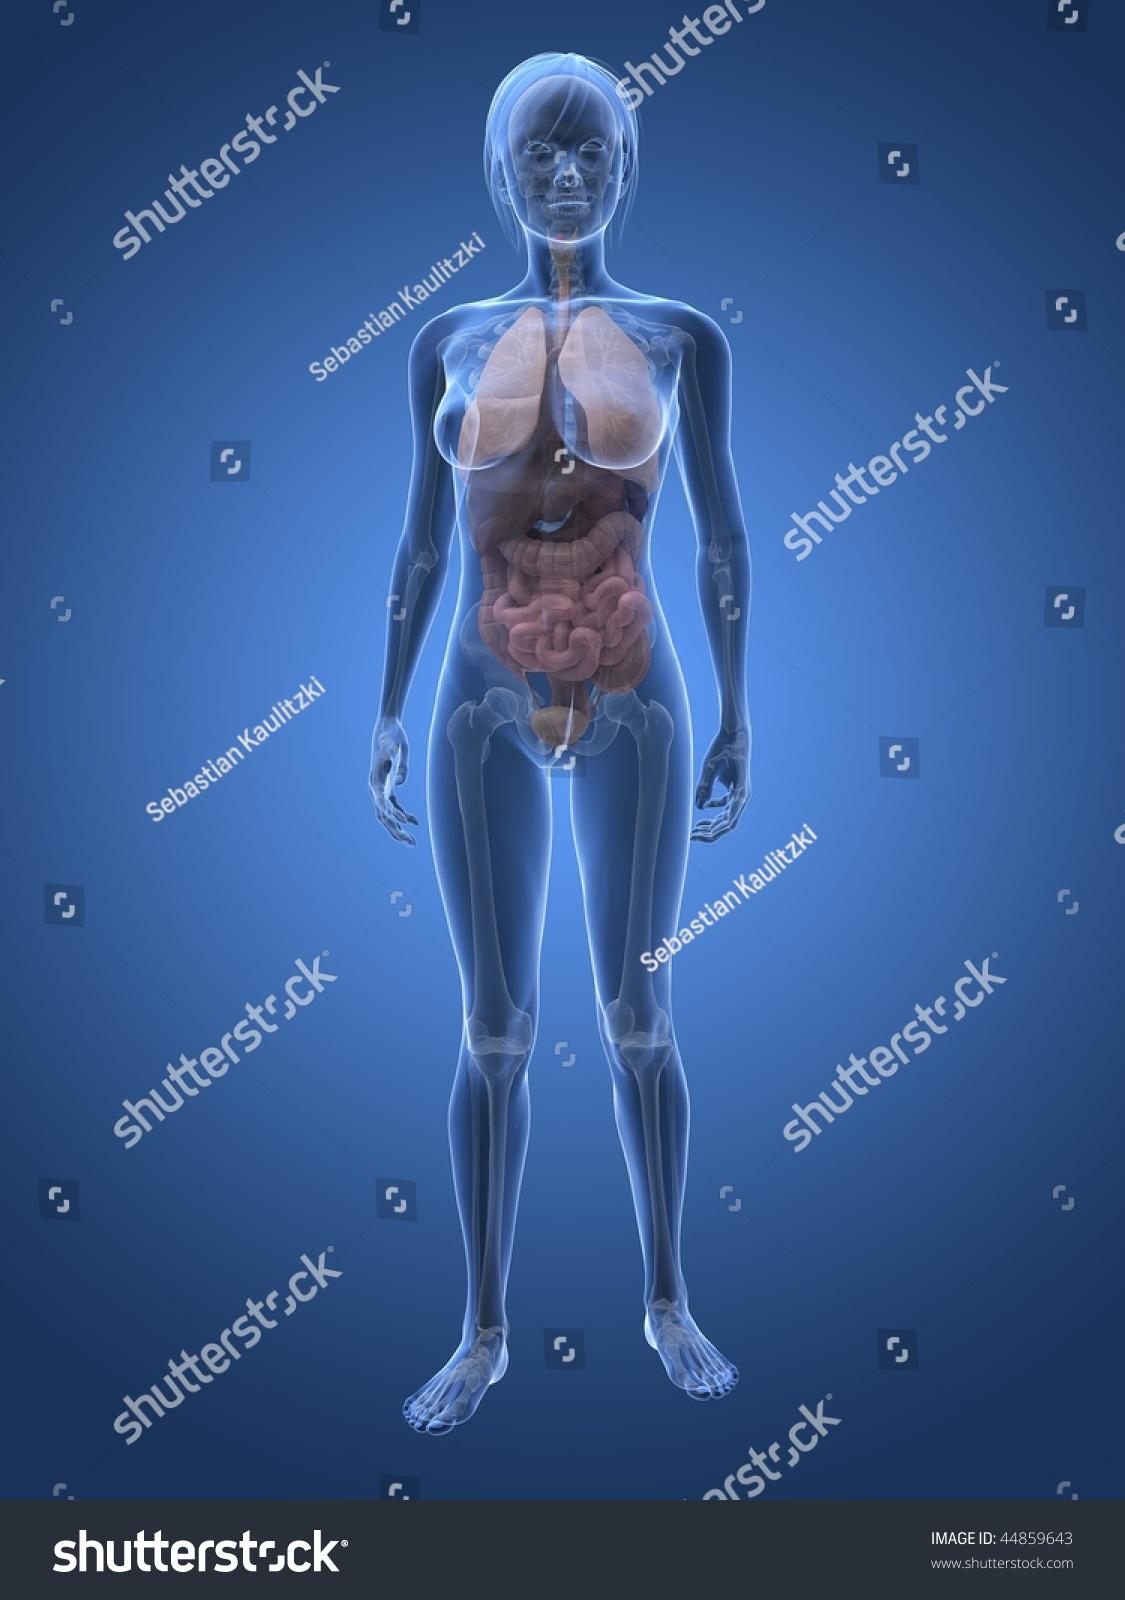 Female Anatomy Stock Illustration 44859643 - Shutterstock